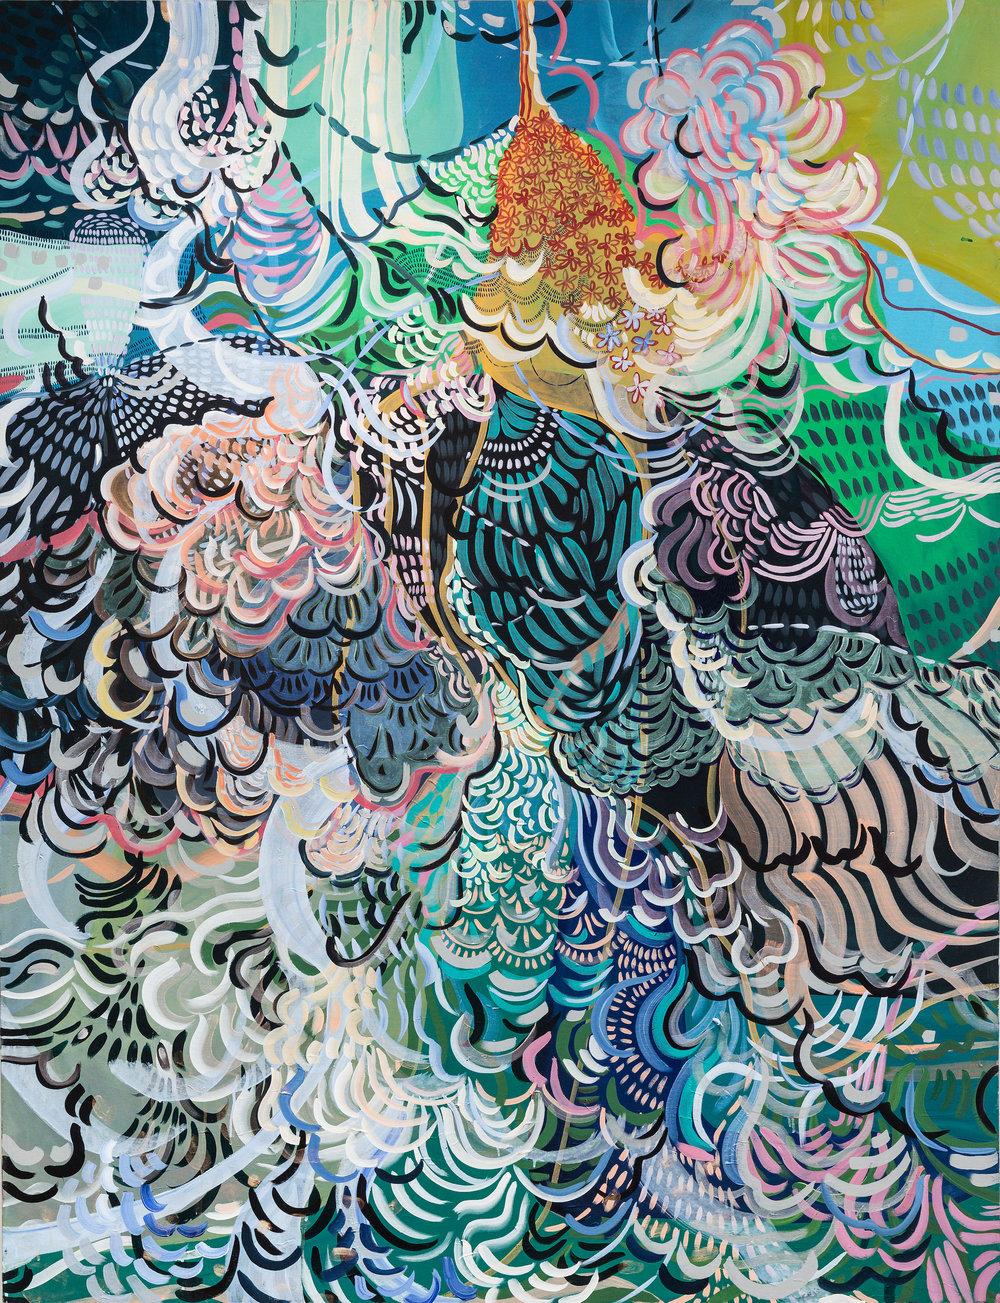 Wylie Garcia, Je Crois Entendre Encore, Acrylic on Cotton, 72 x 66, 2017, 5,000 2500px.jpeg